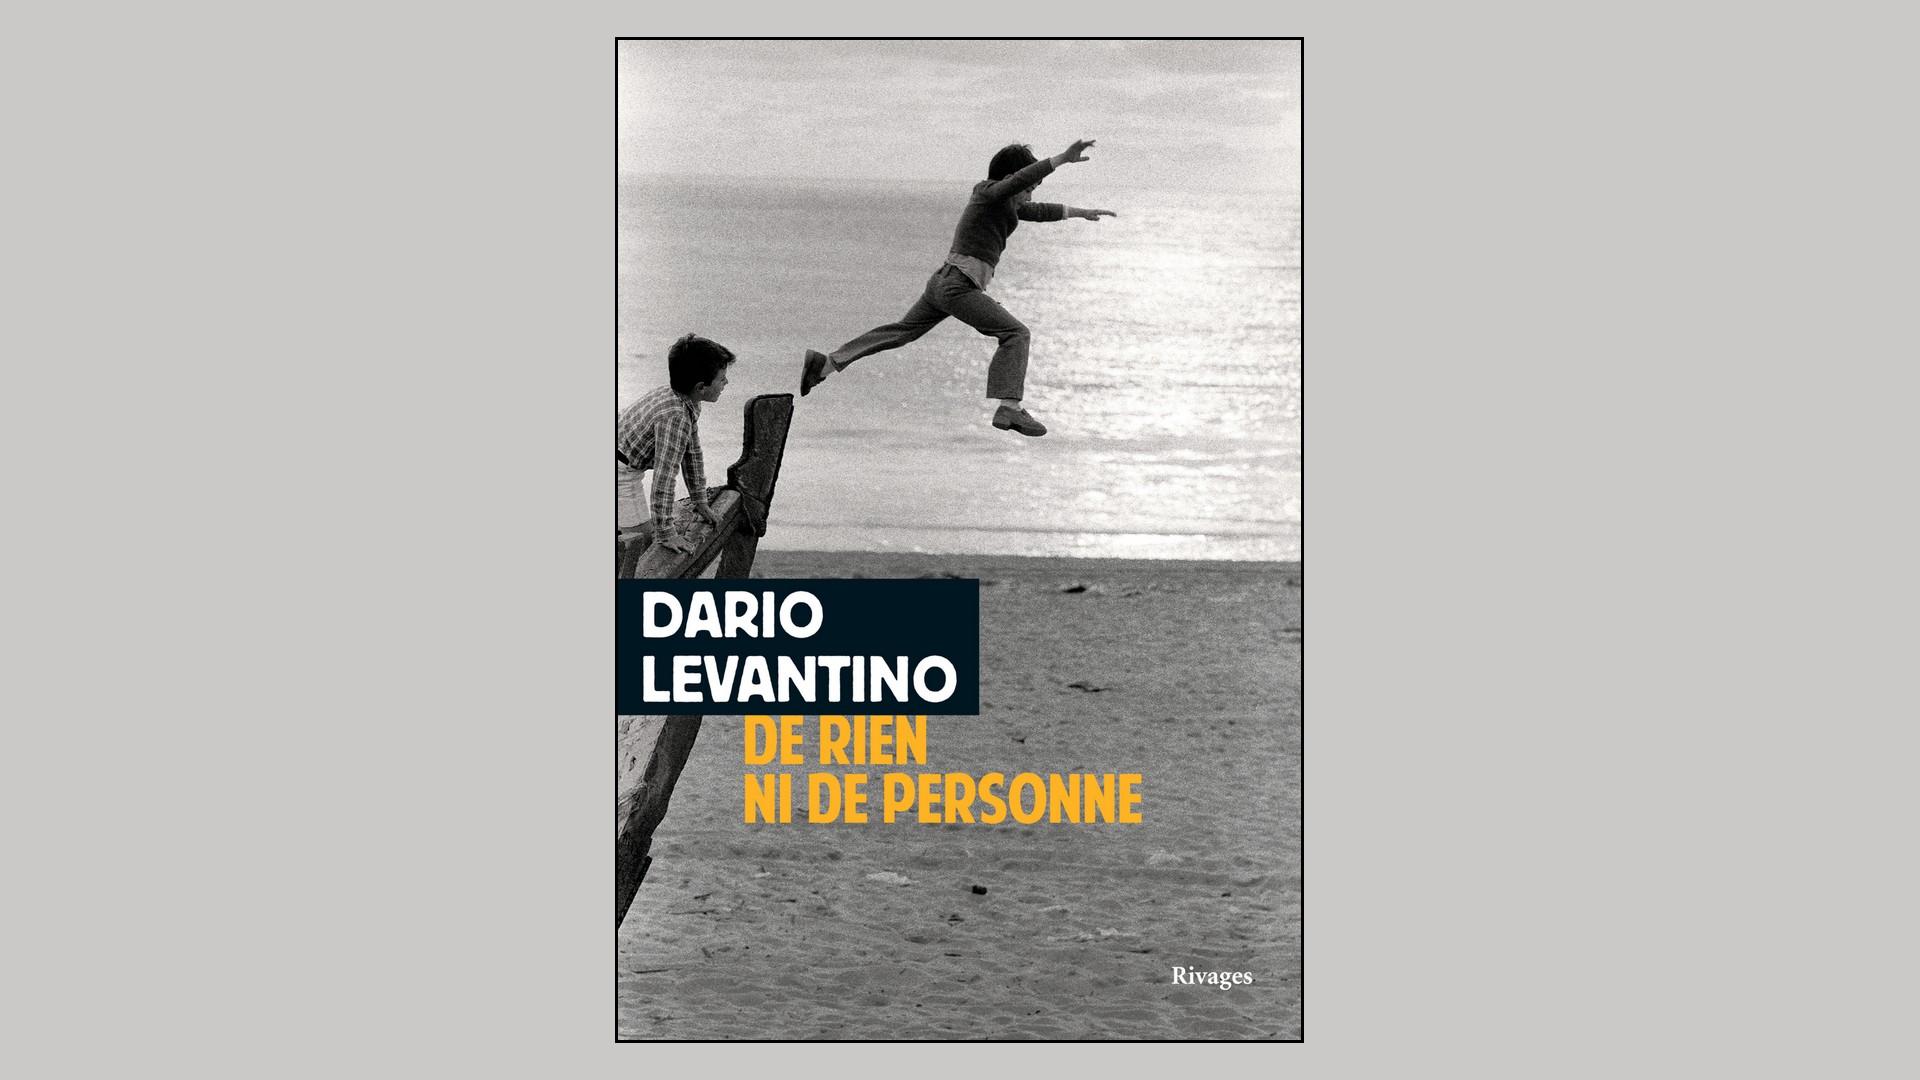 Livres – De rien ni de personne (1) – Dario Levantino